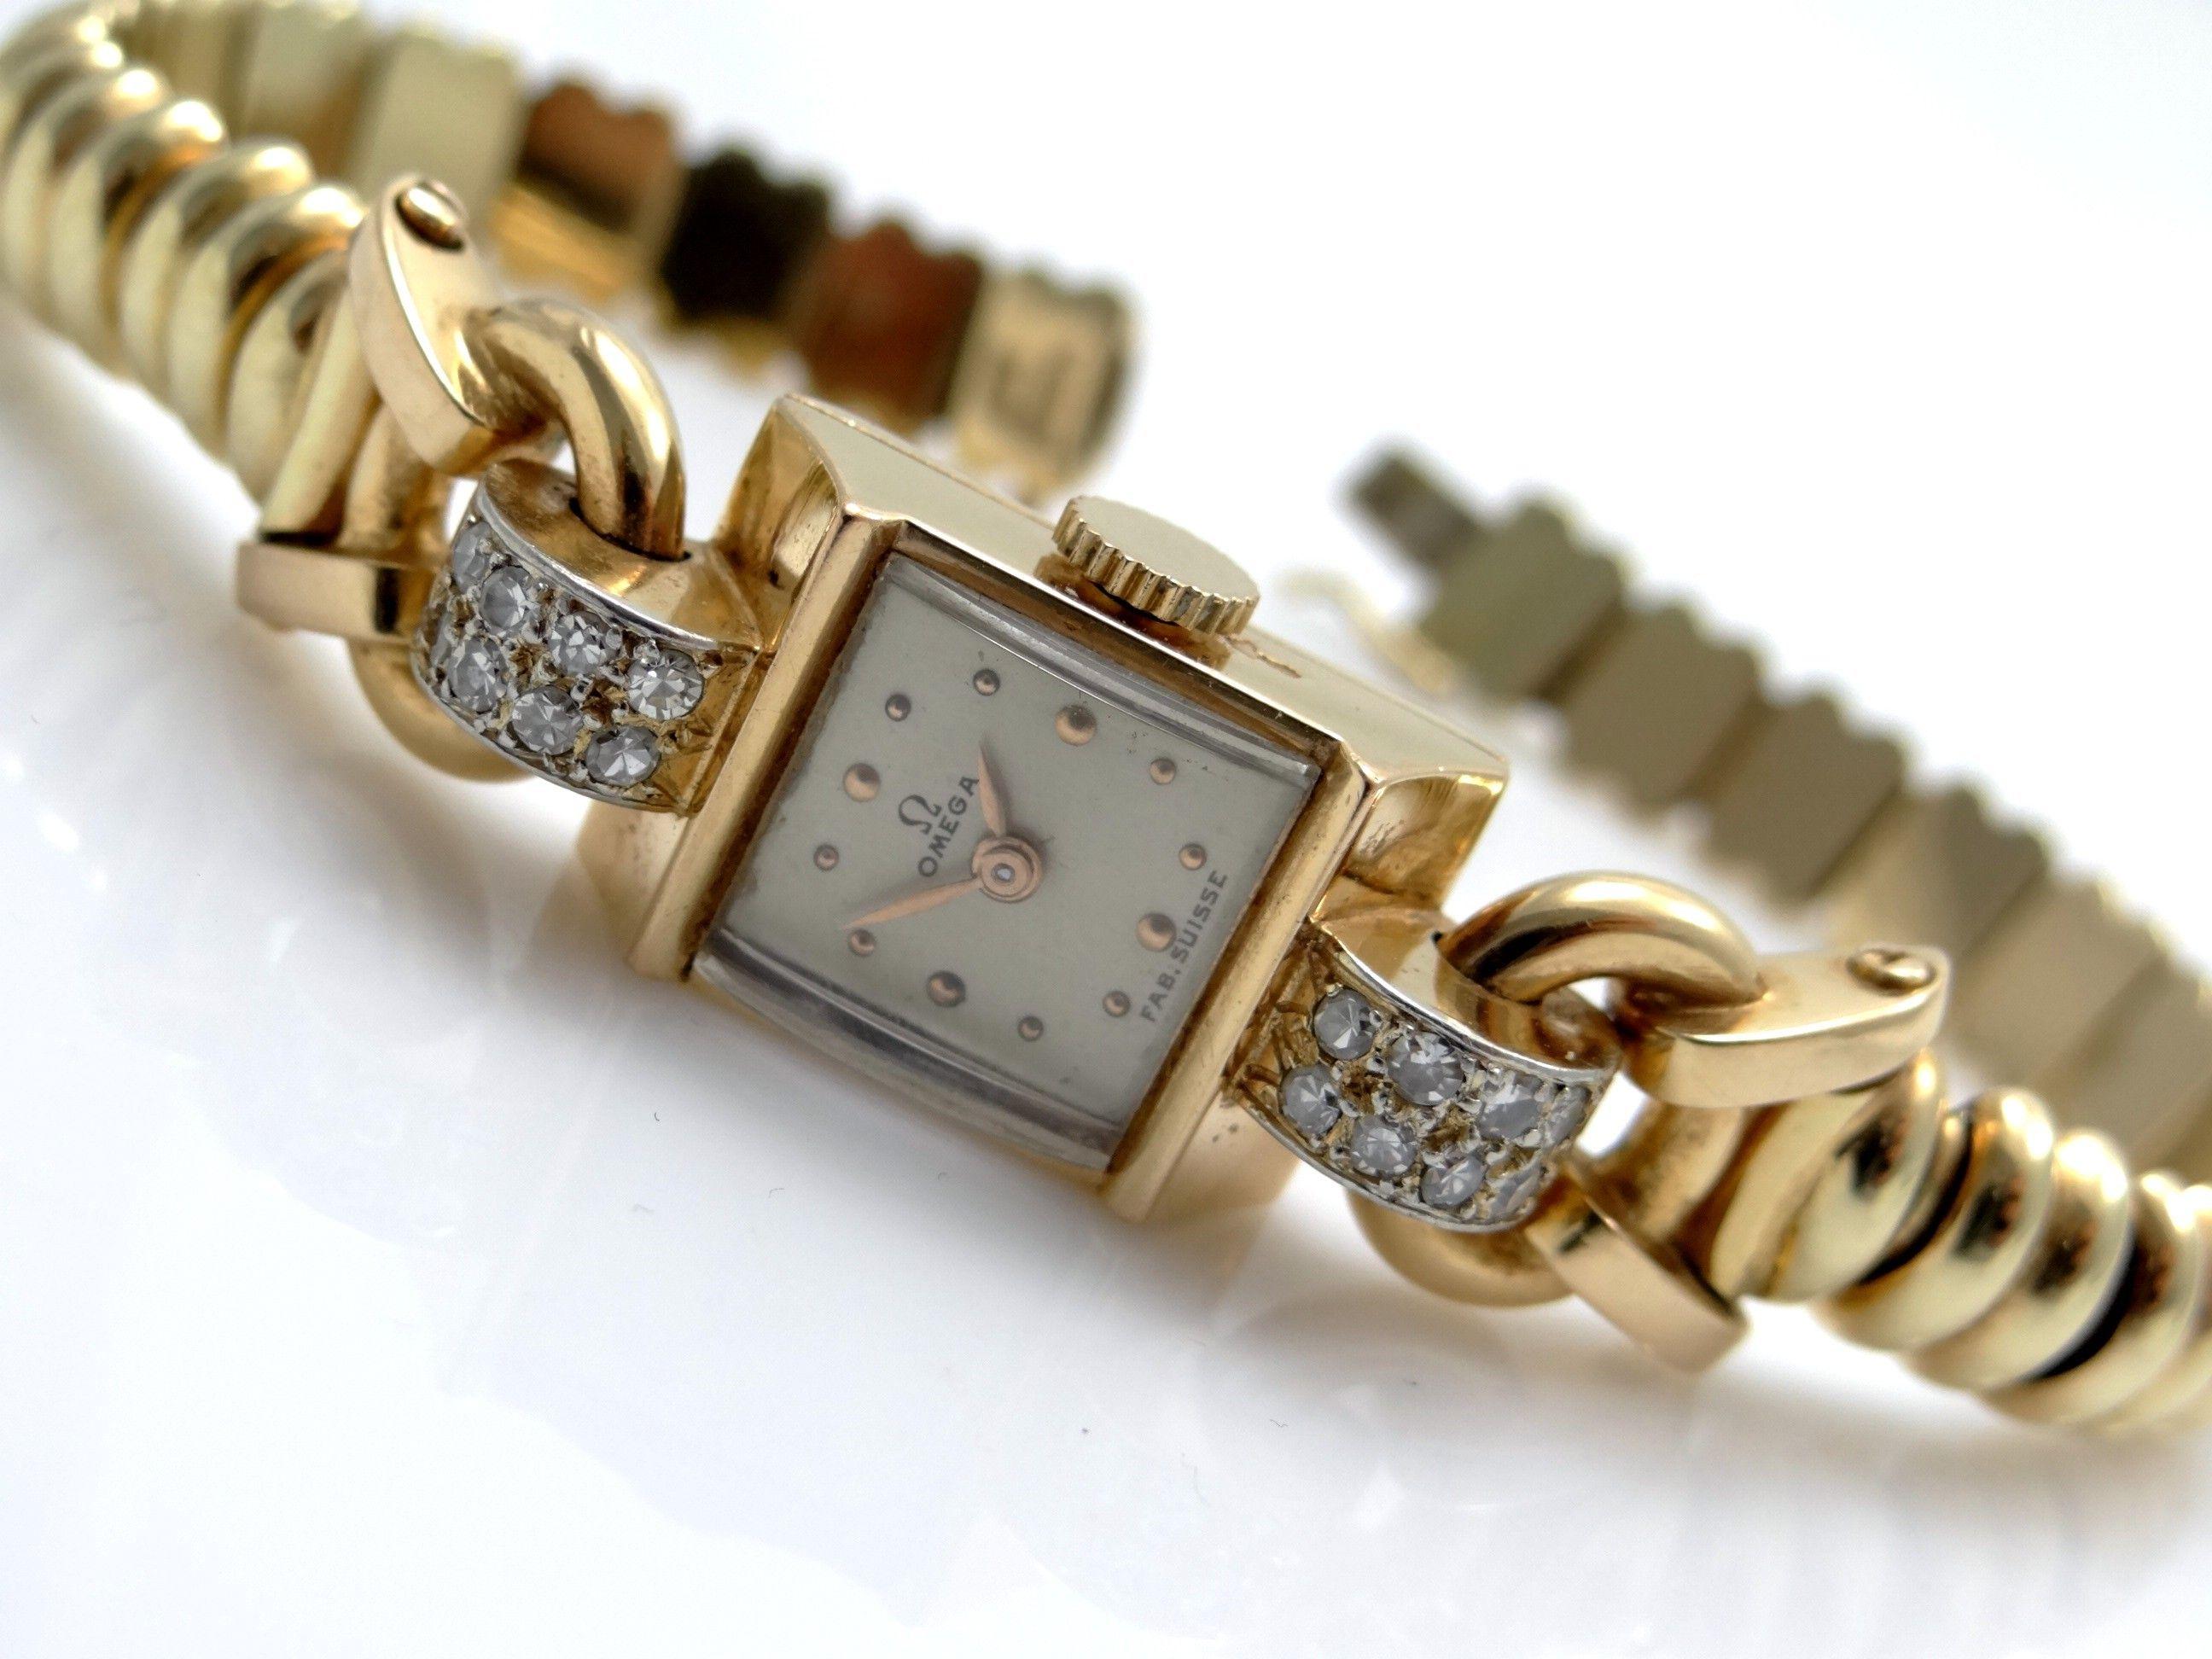 Omega damenuhr gold 585  Modeschmuck